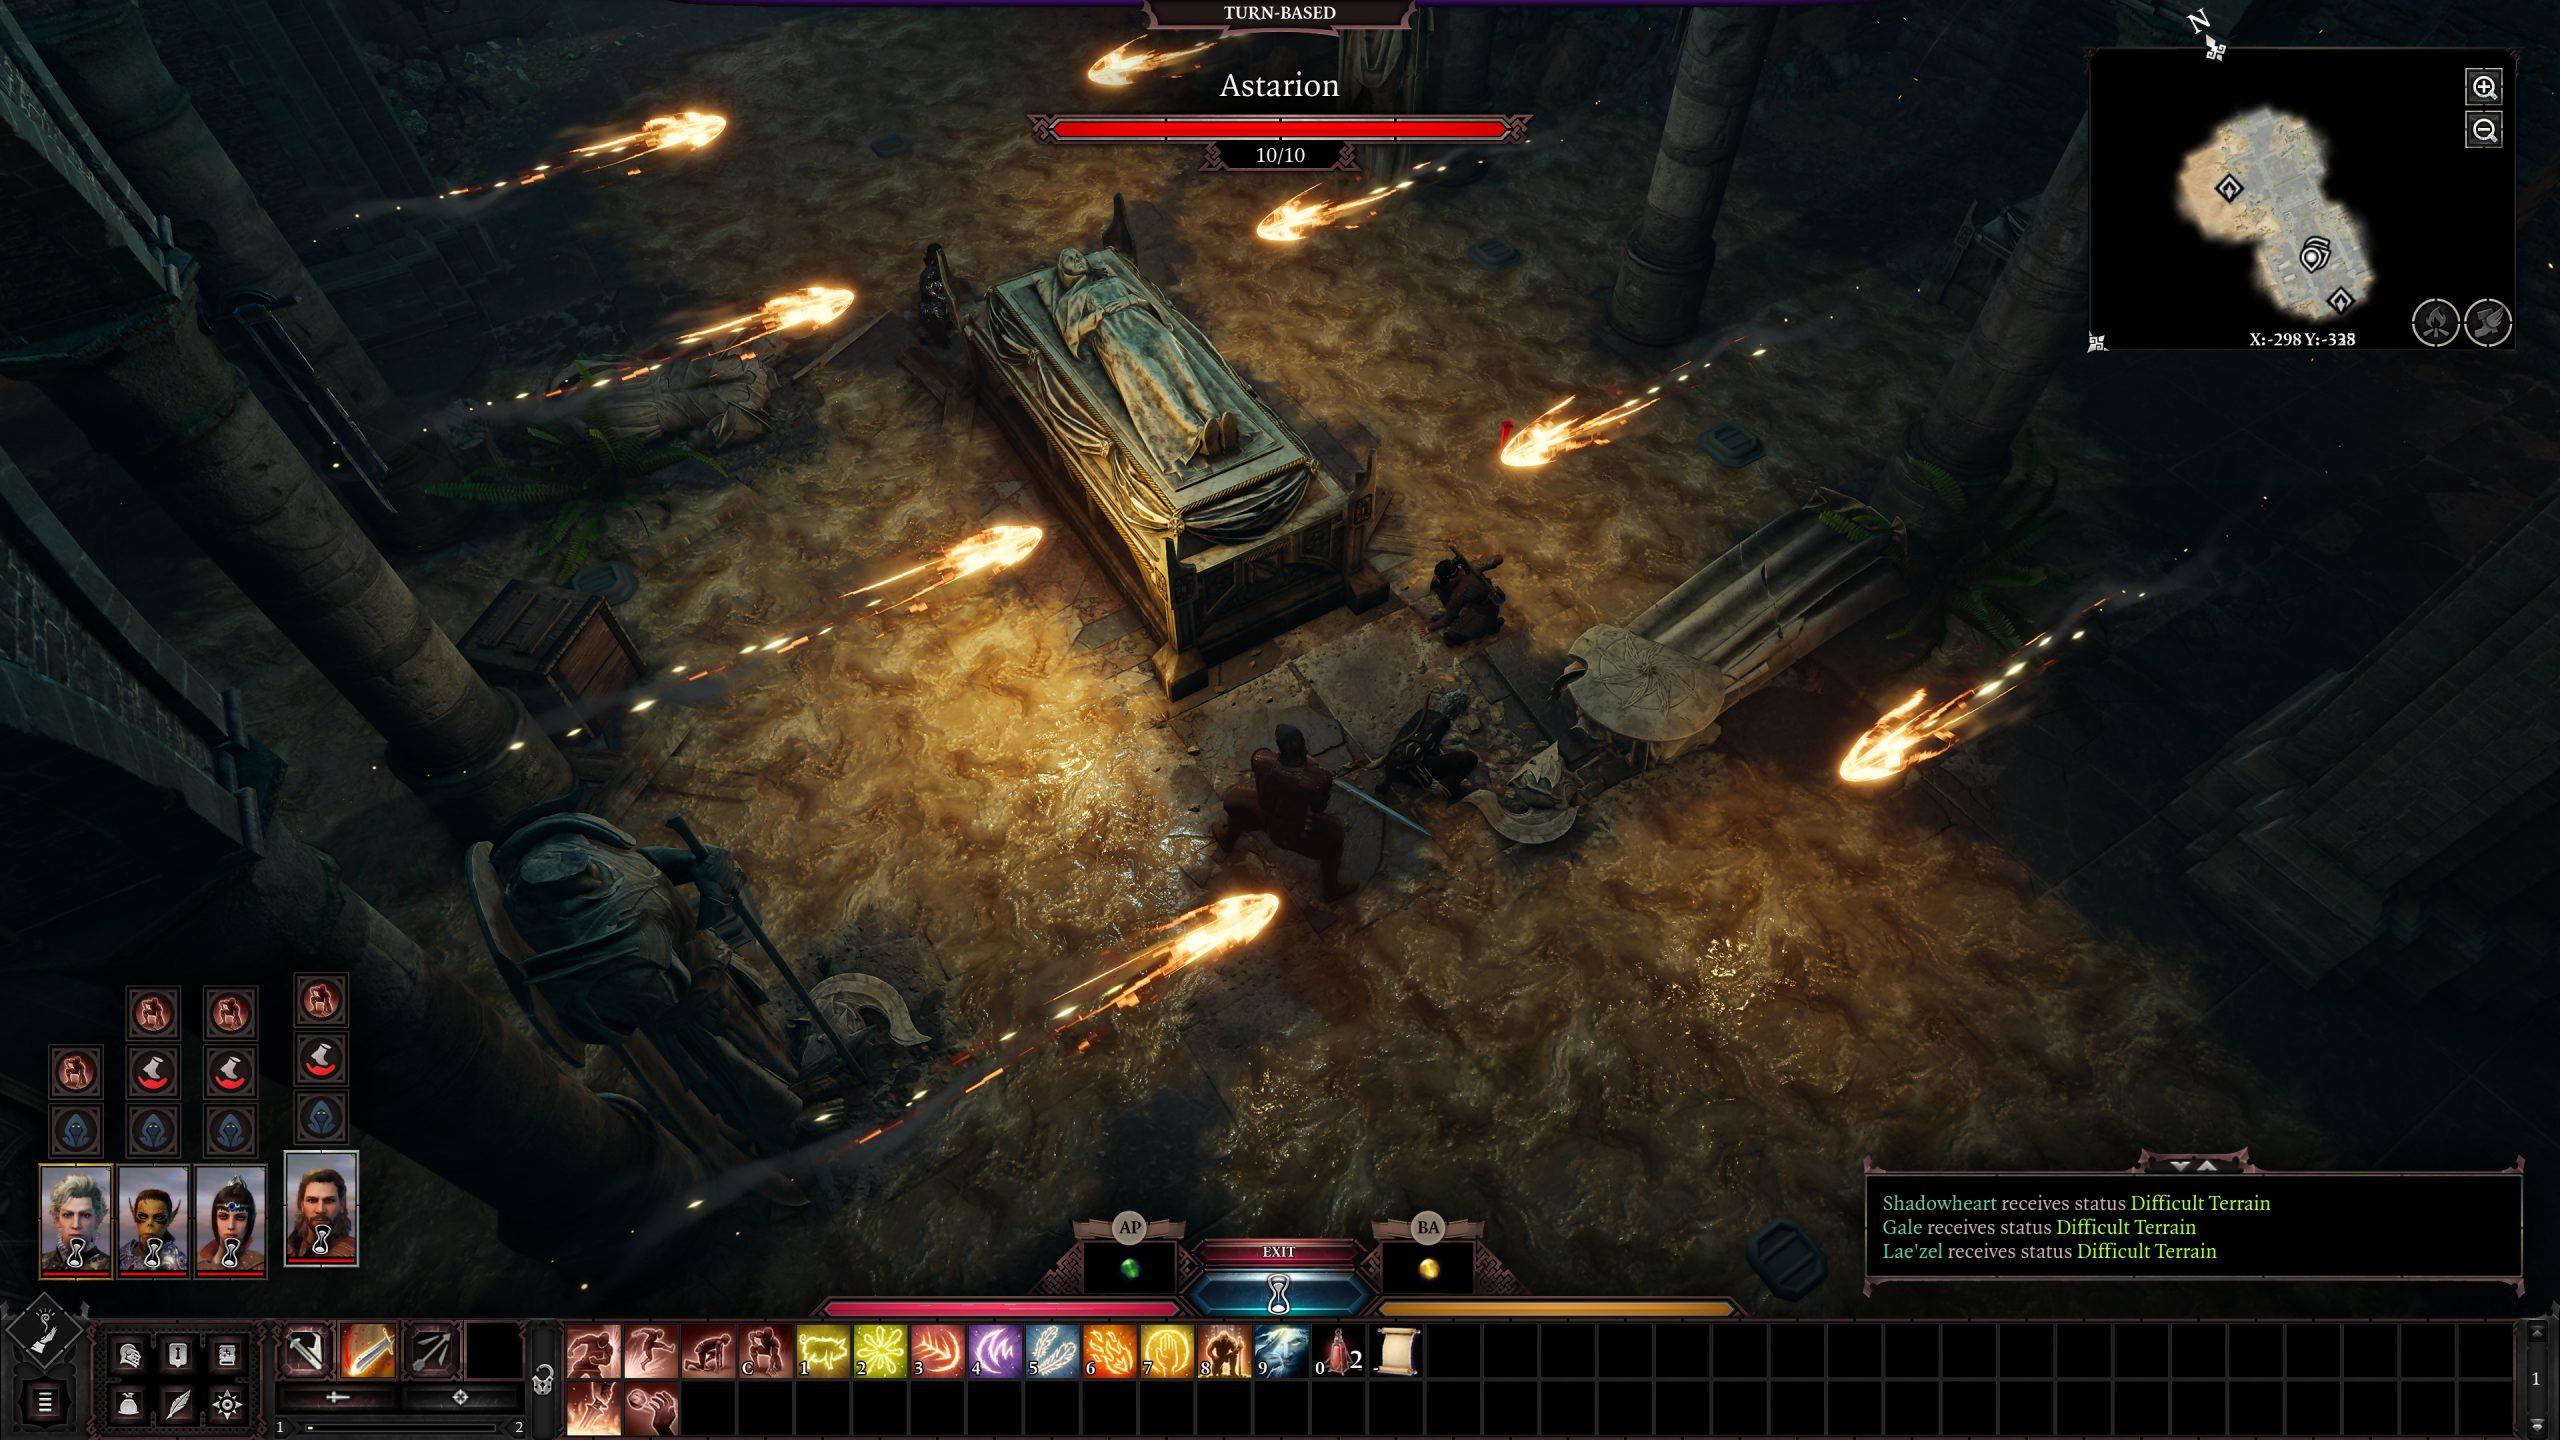 Утечка: скриншоты Baldur's Gate III 1